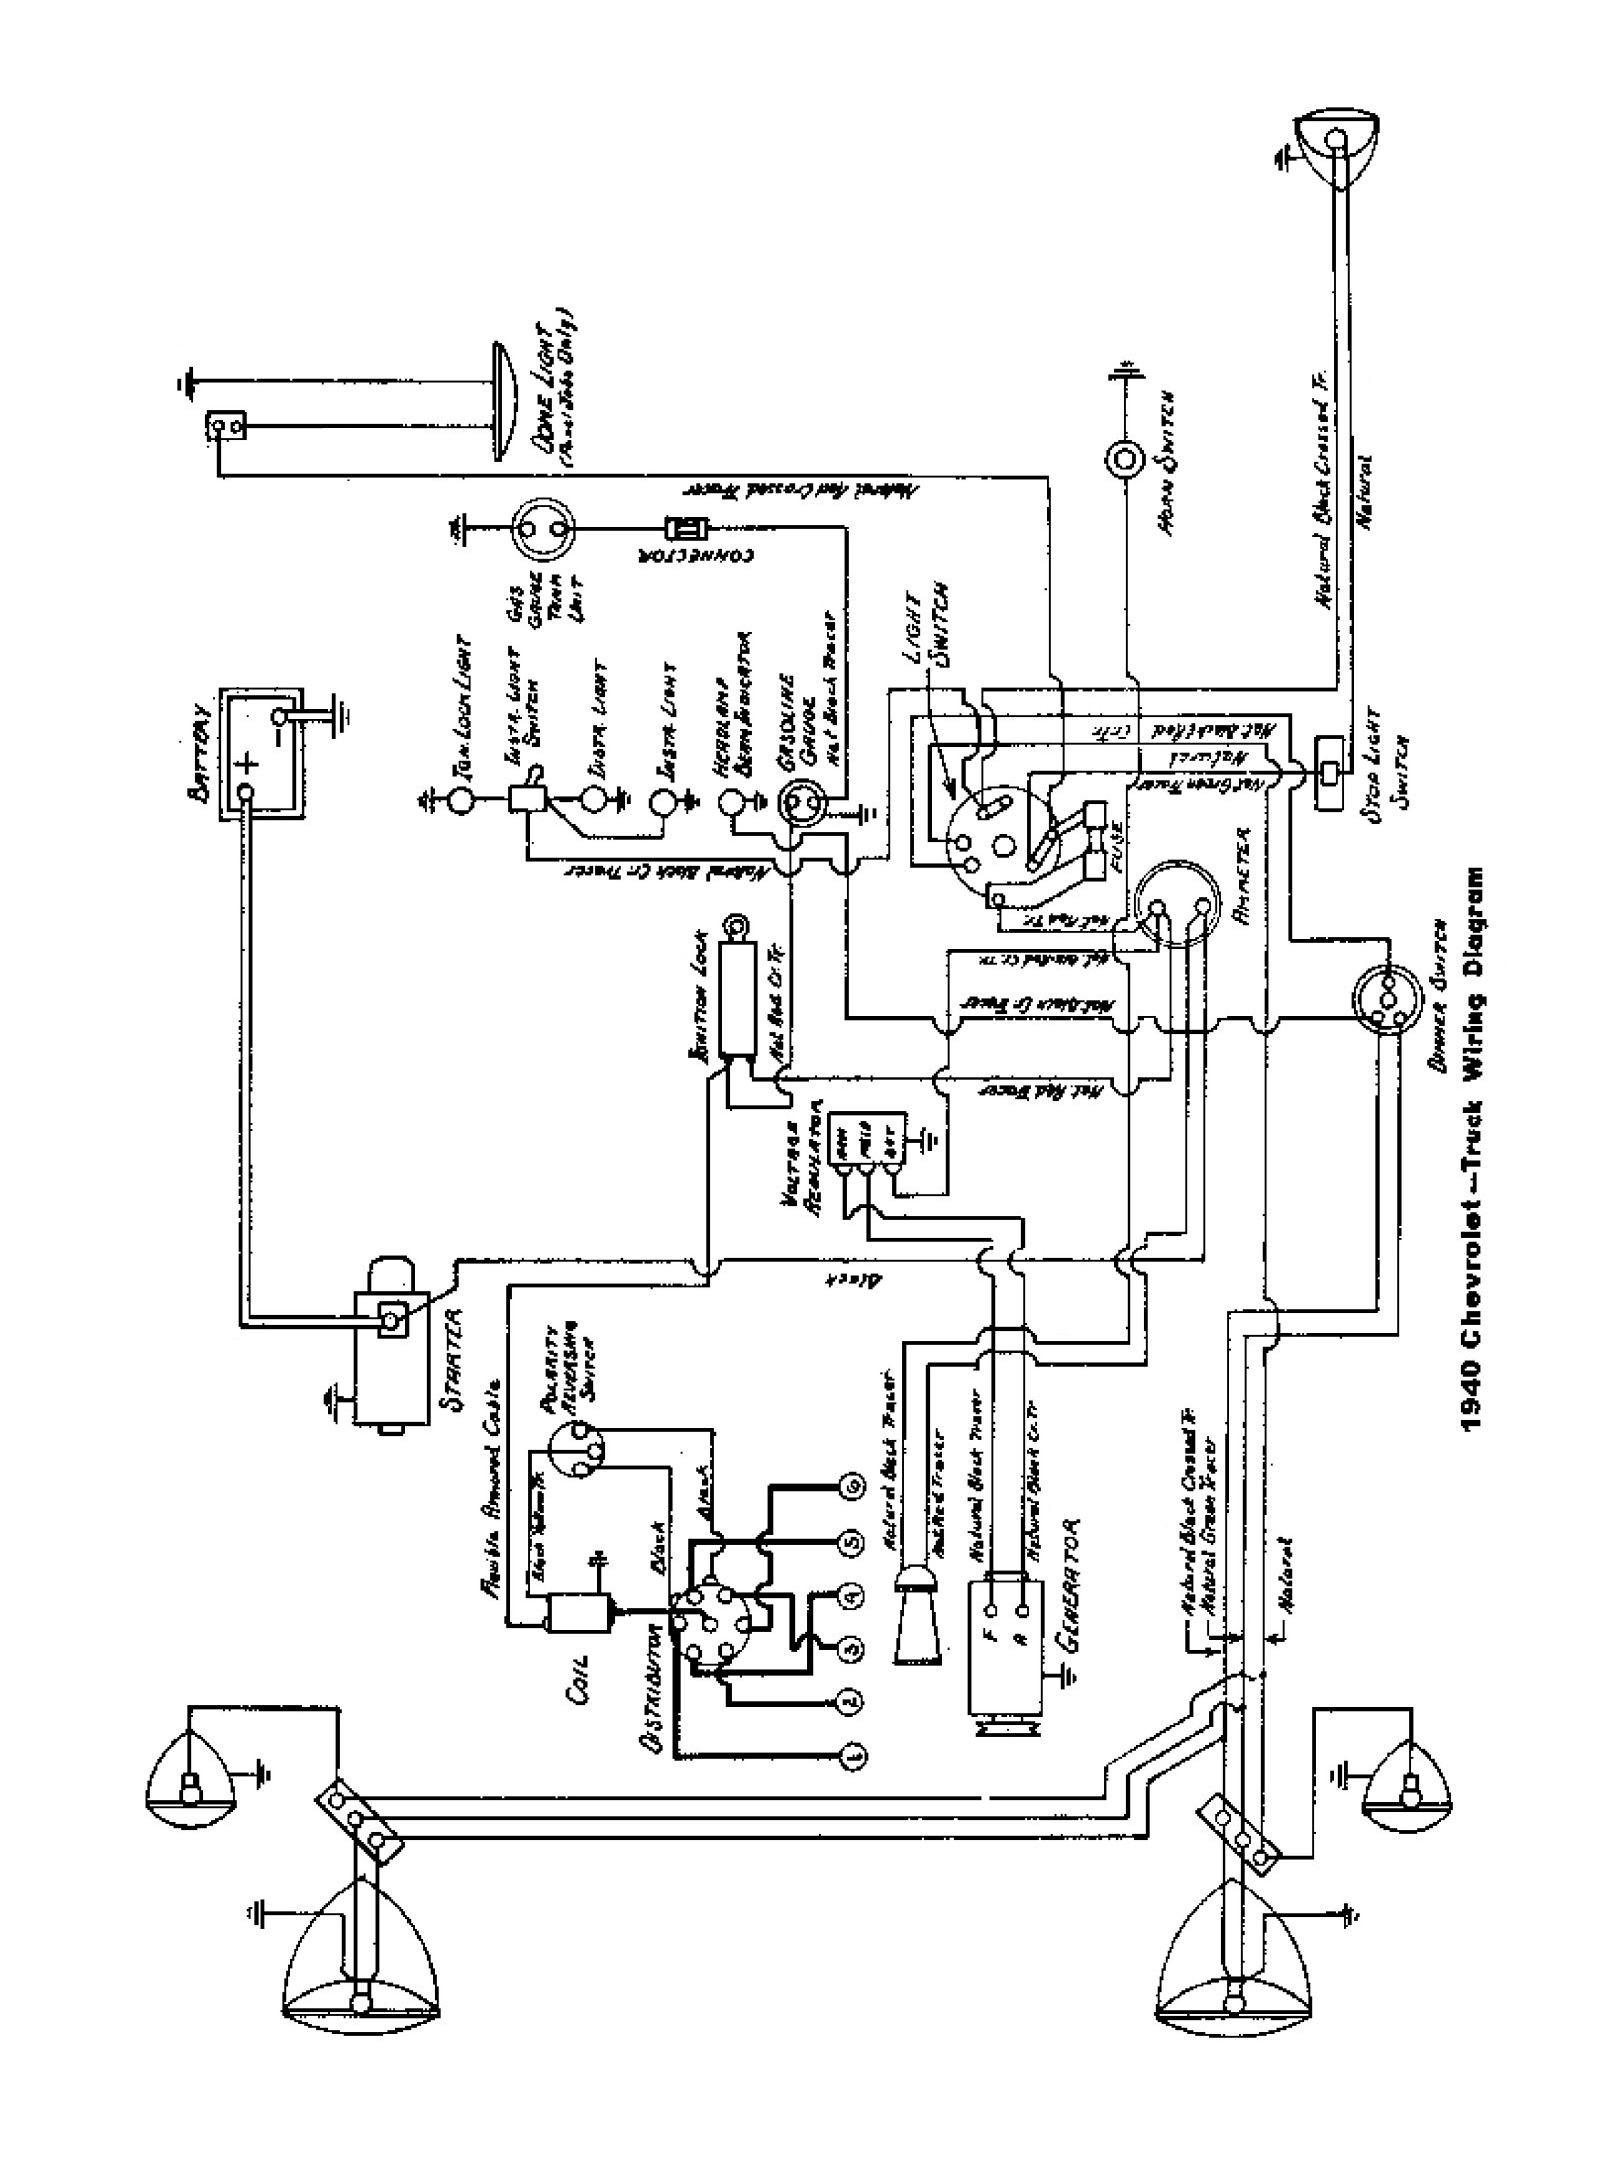 Chevrolet Truck Parts Diagram Chevy Wiring Diagrams